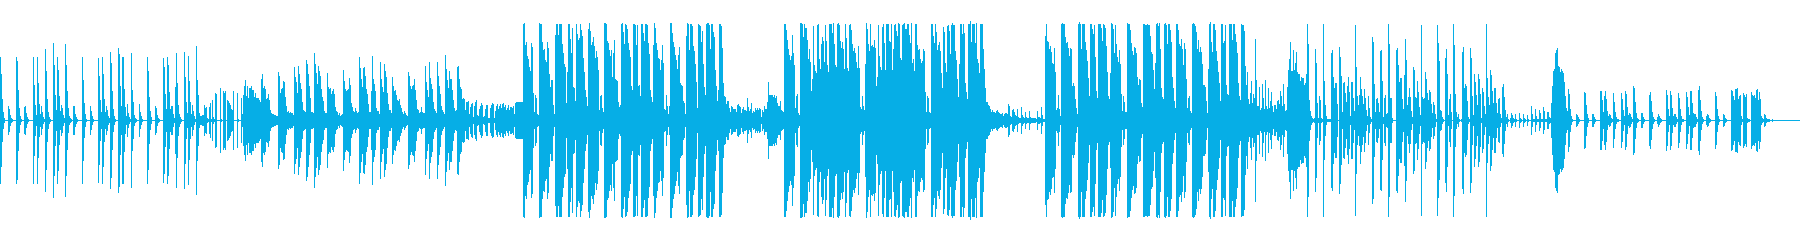 KANTエレクトロヒップなBGMの再生済みの波形